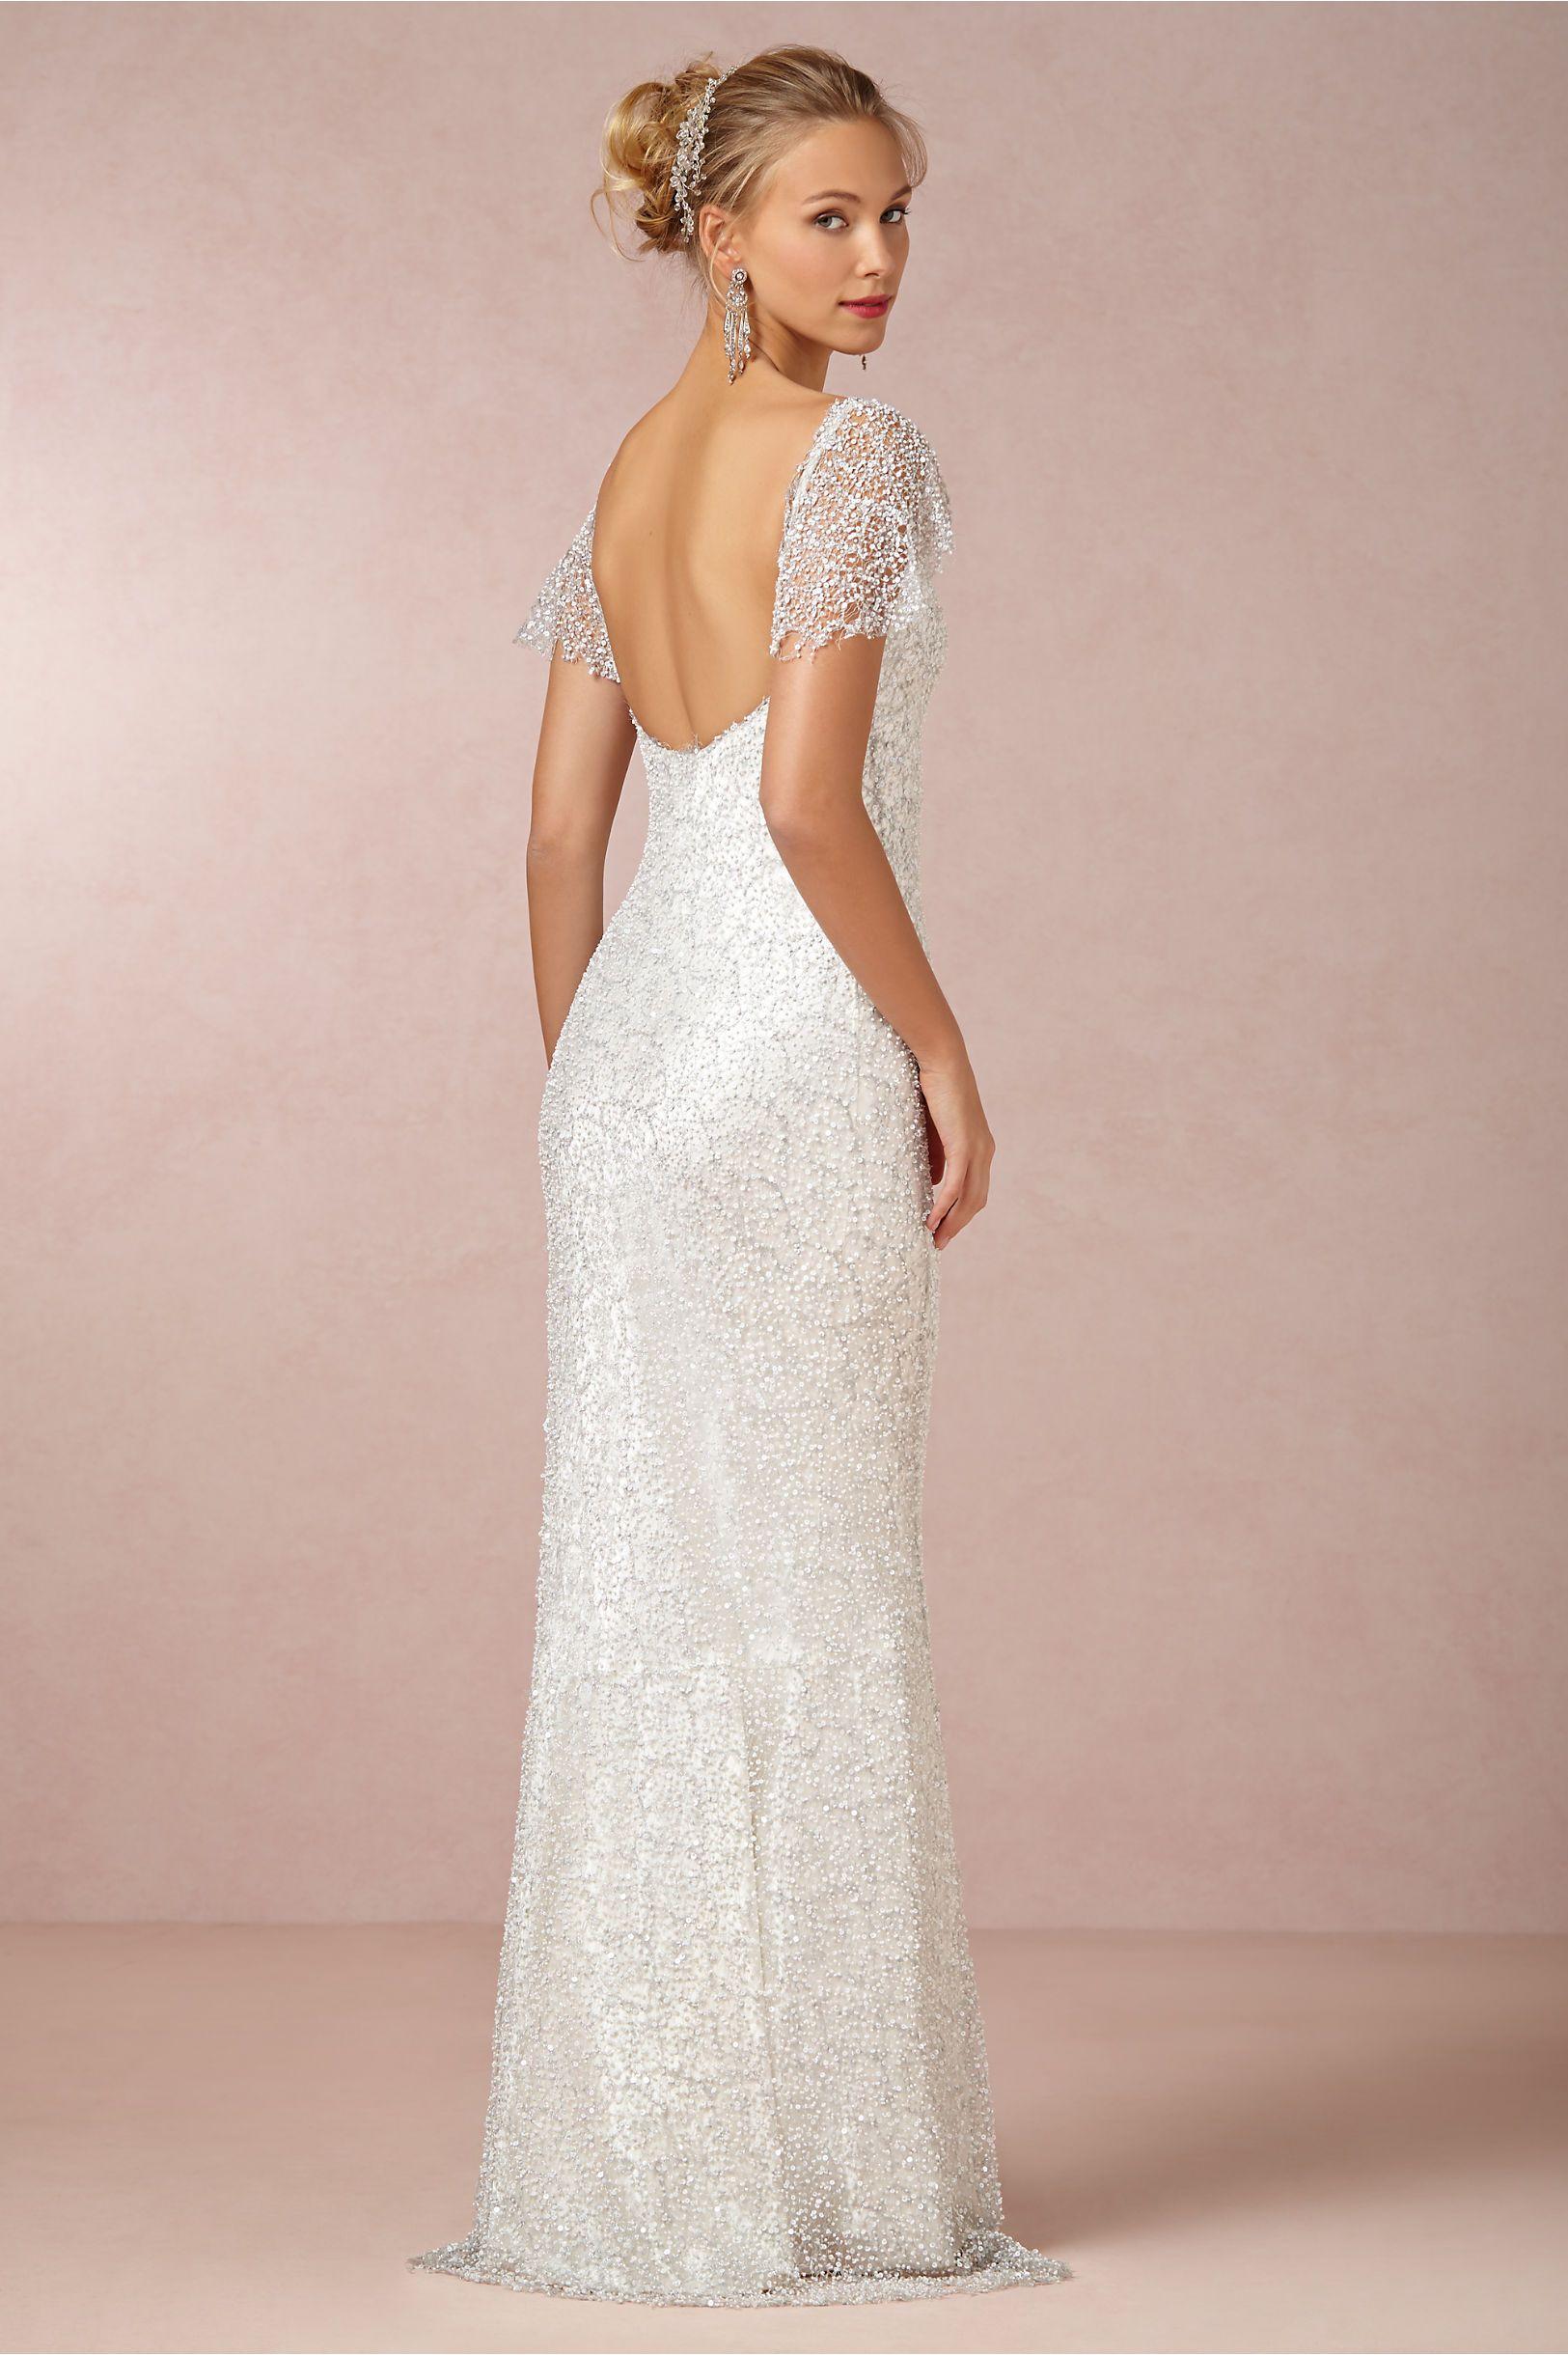 Snowflake Gown in Sale at BHLDN | Winter Wedding Ideas | Pinterest ...